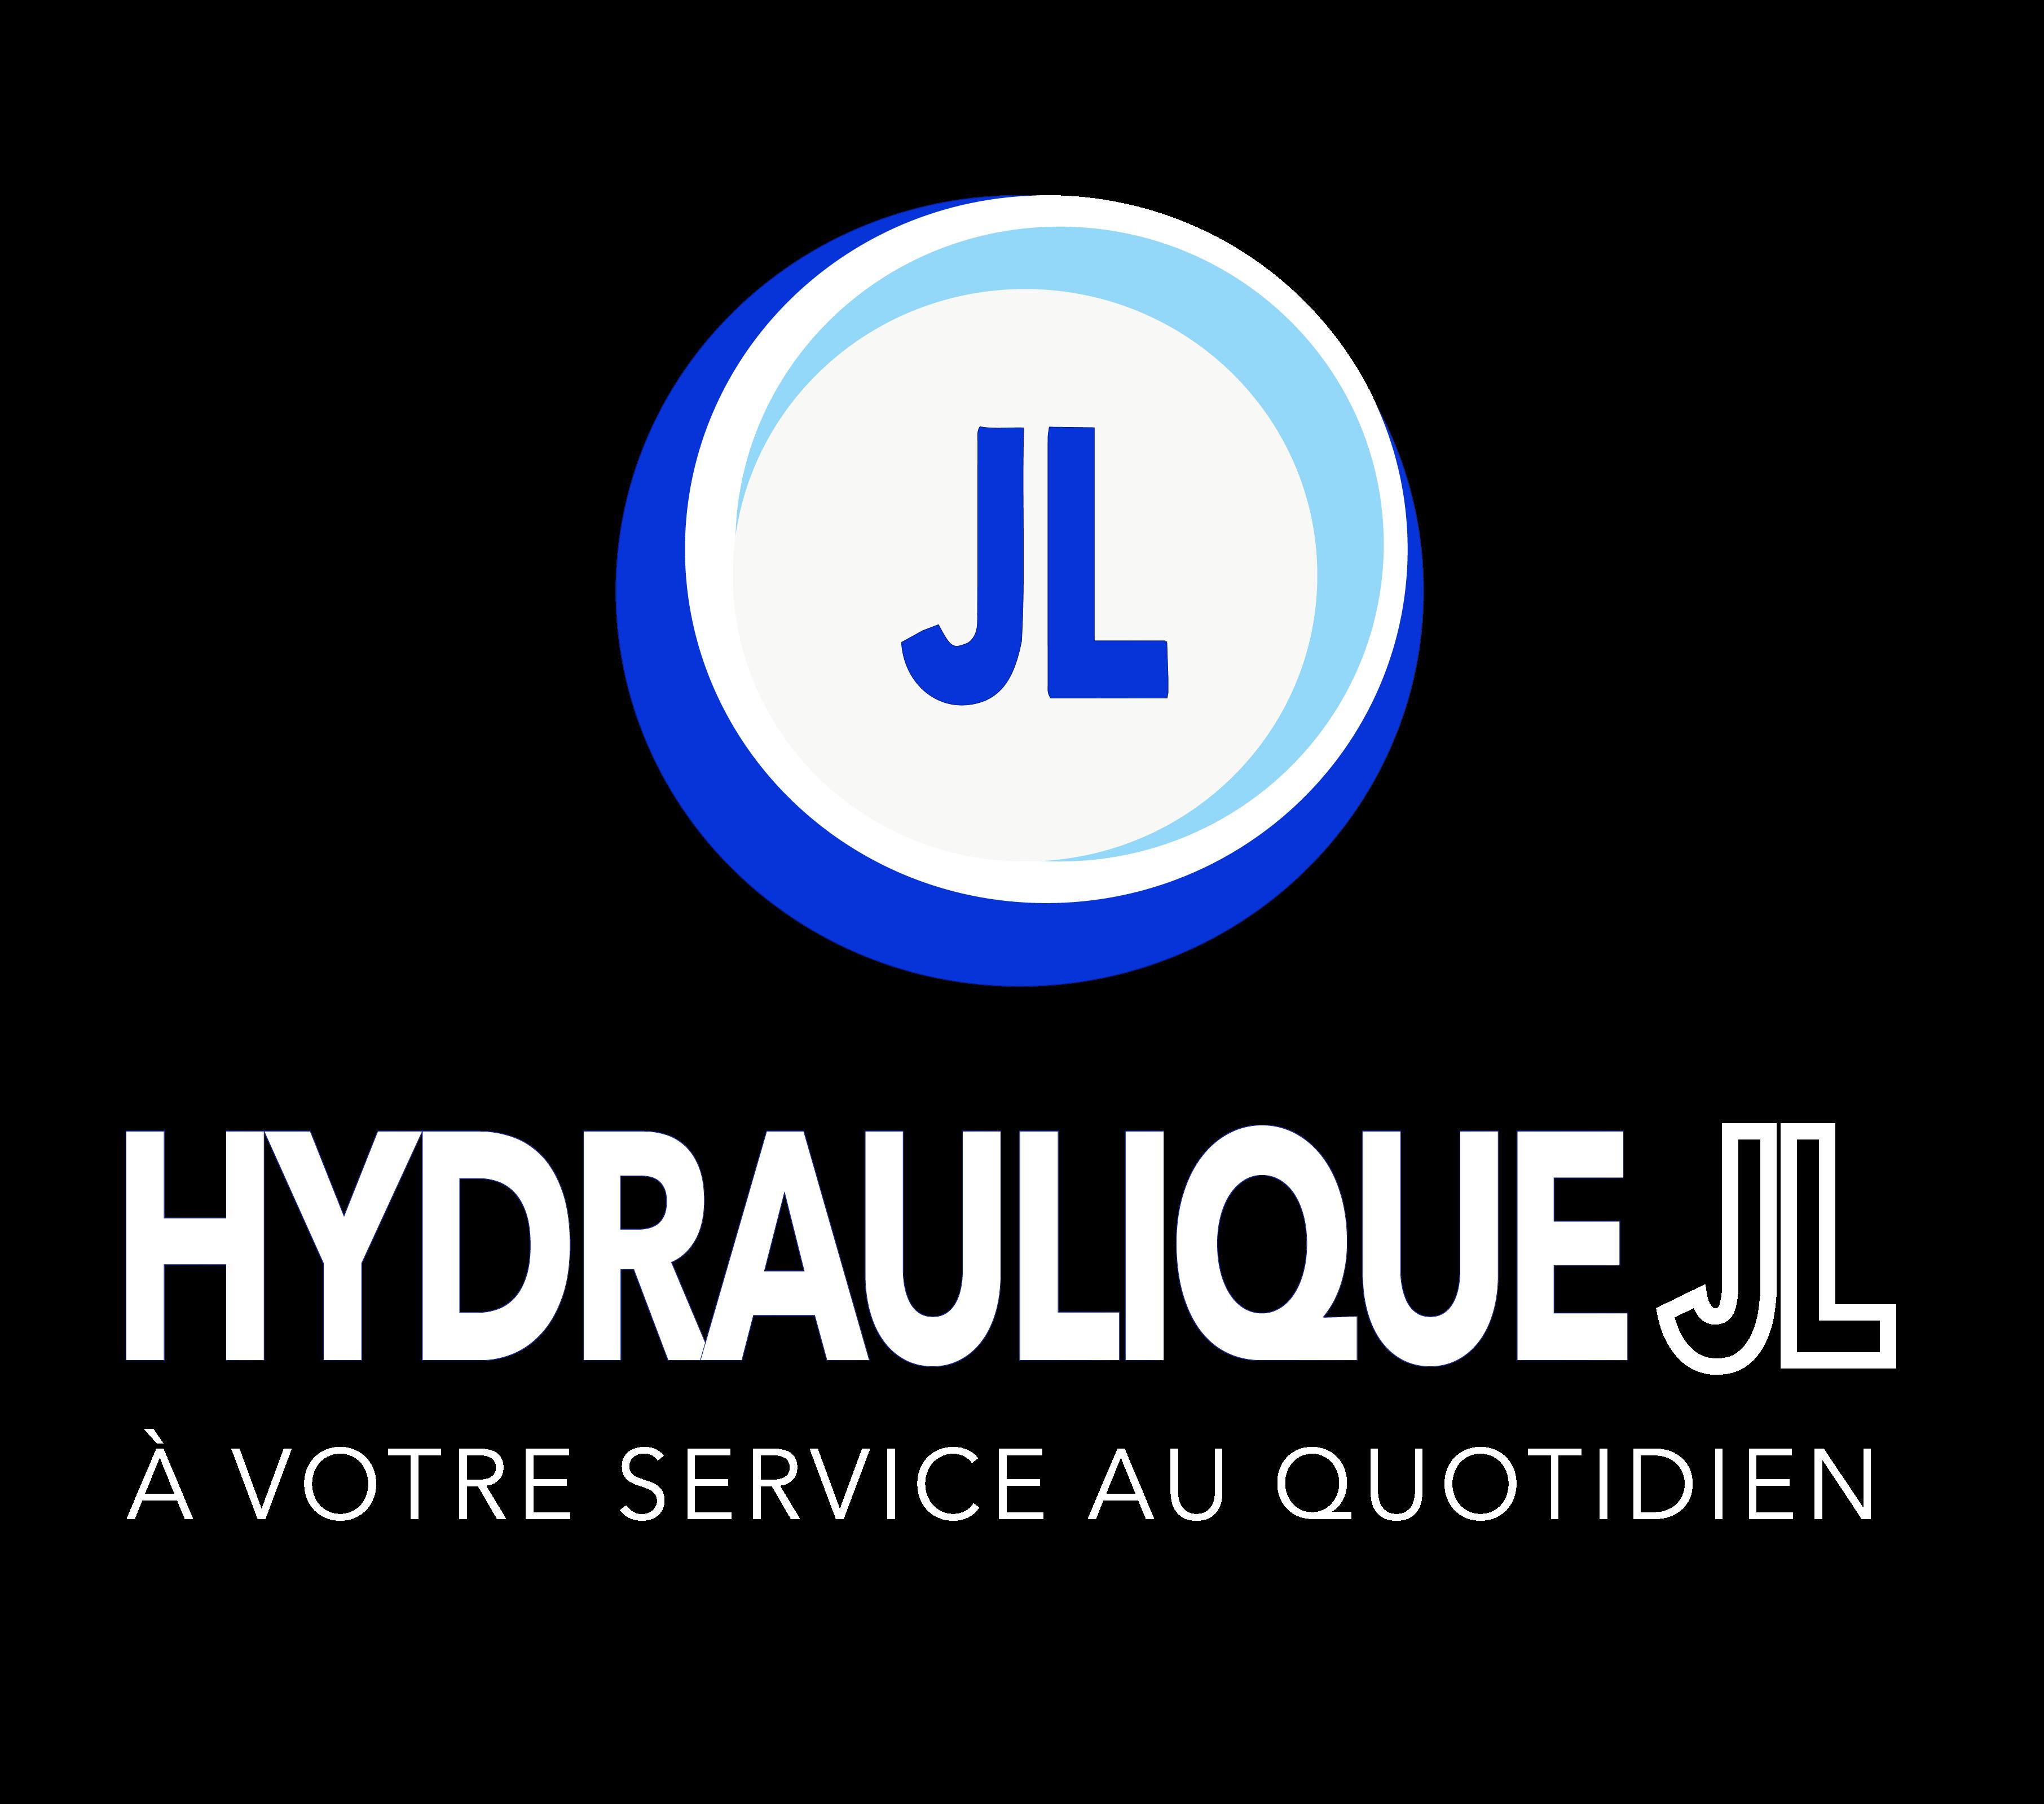 logo steve 1 copy 3